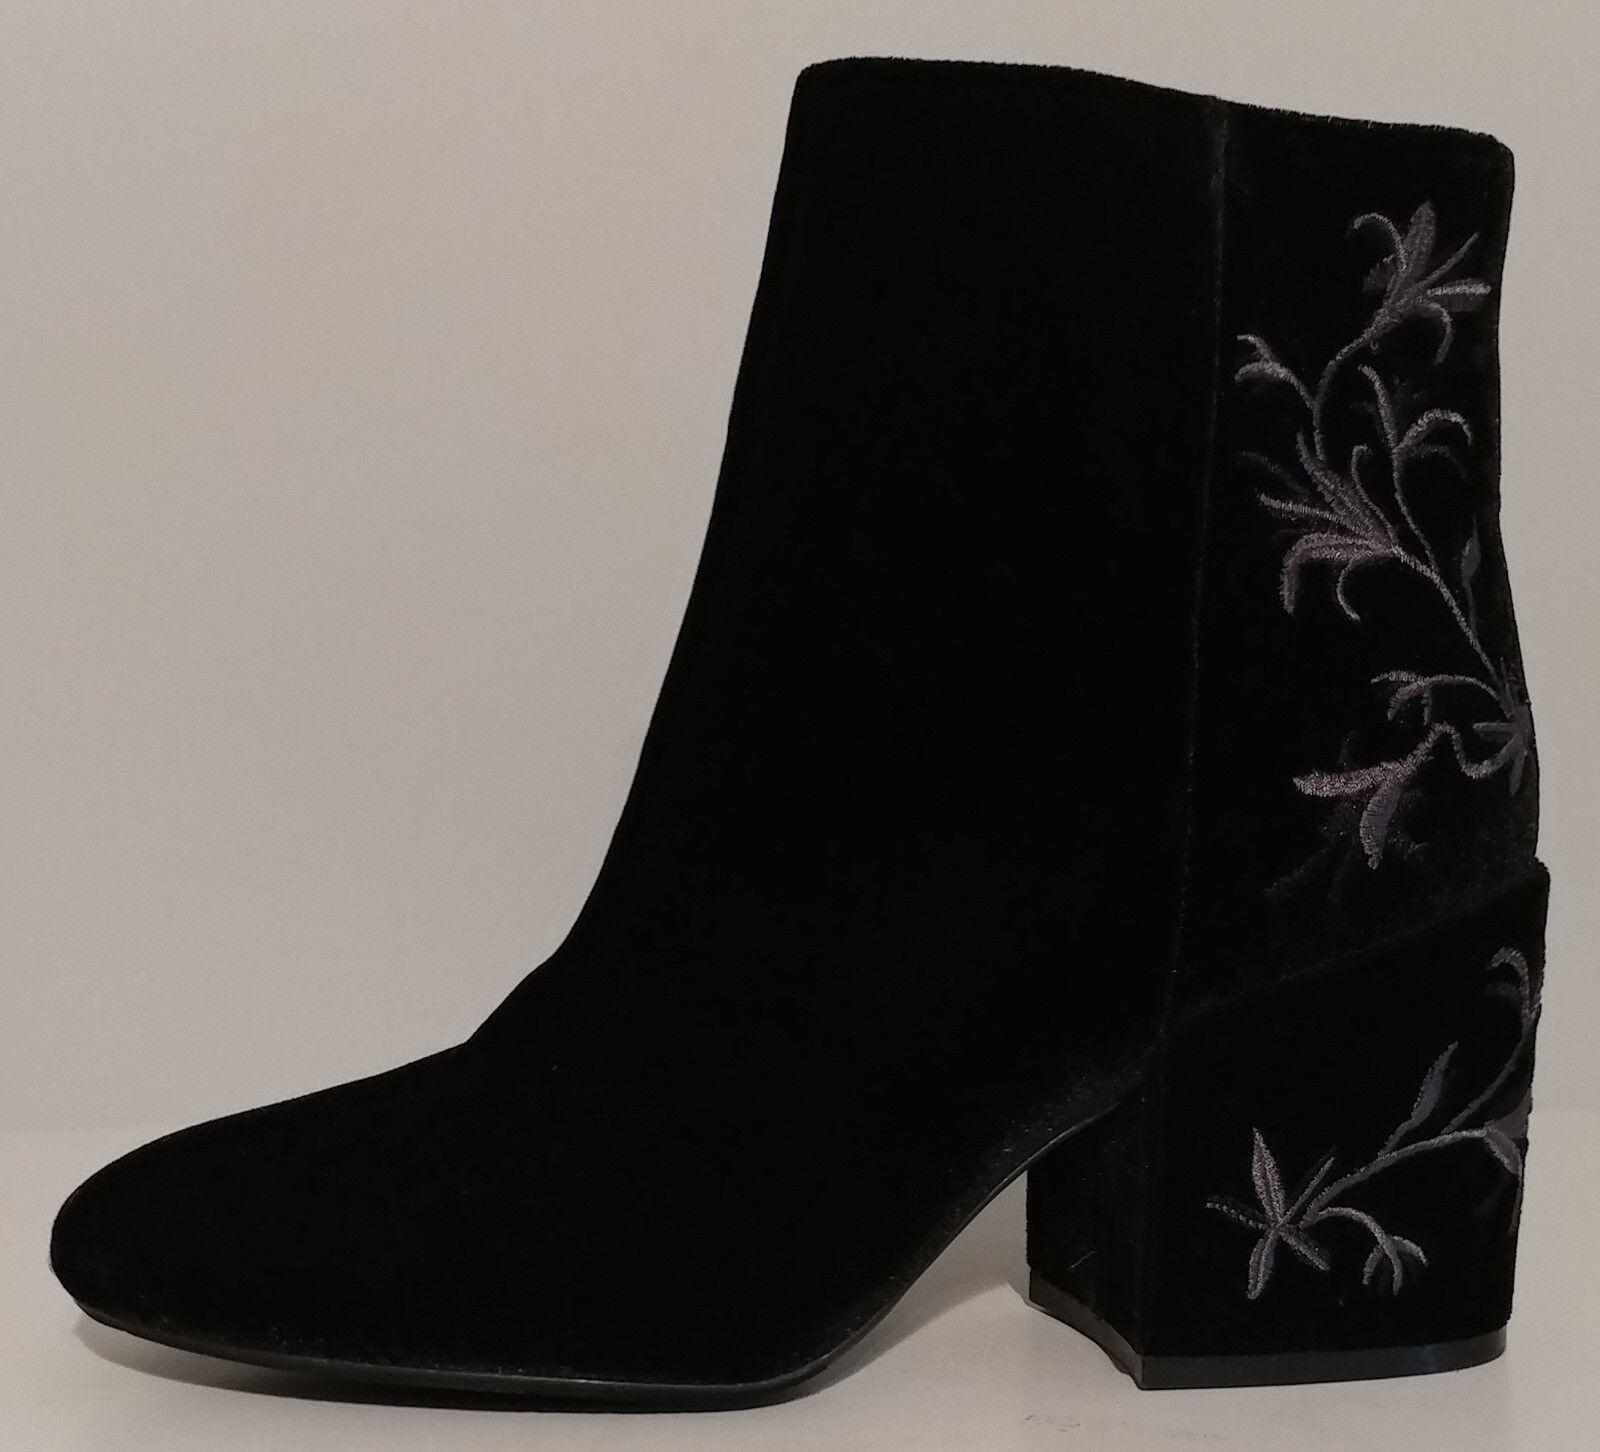 NEW!! Kenneth Cole Black Velvet Ankle Boots 3